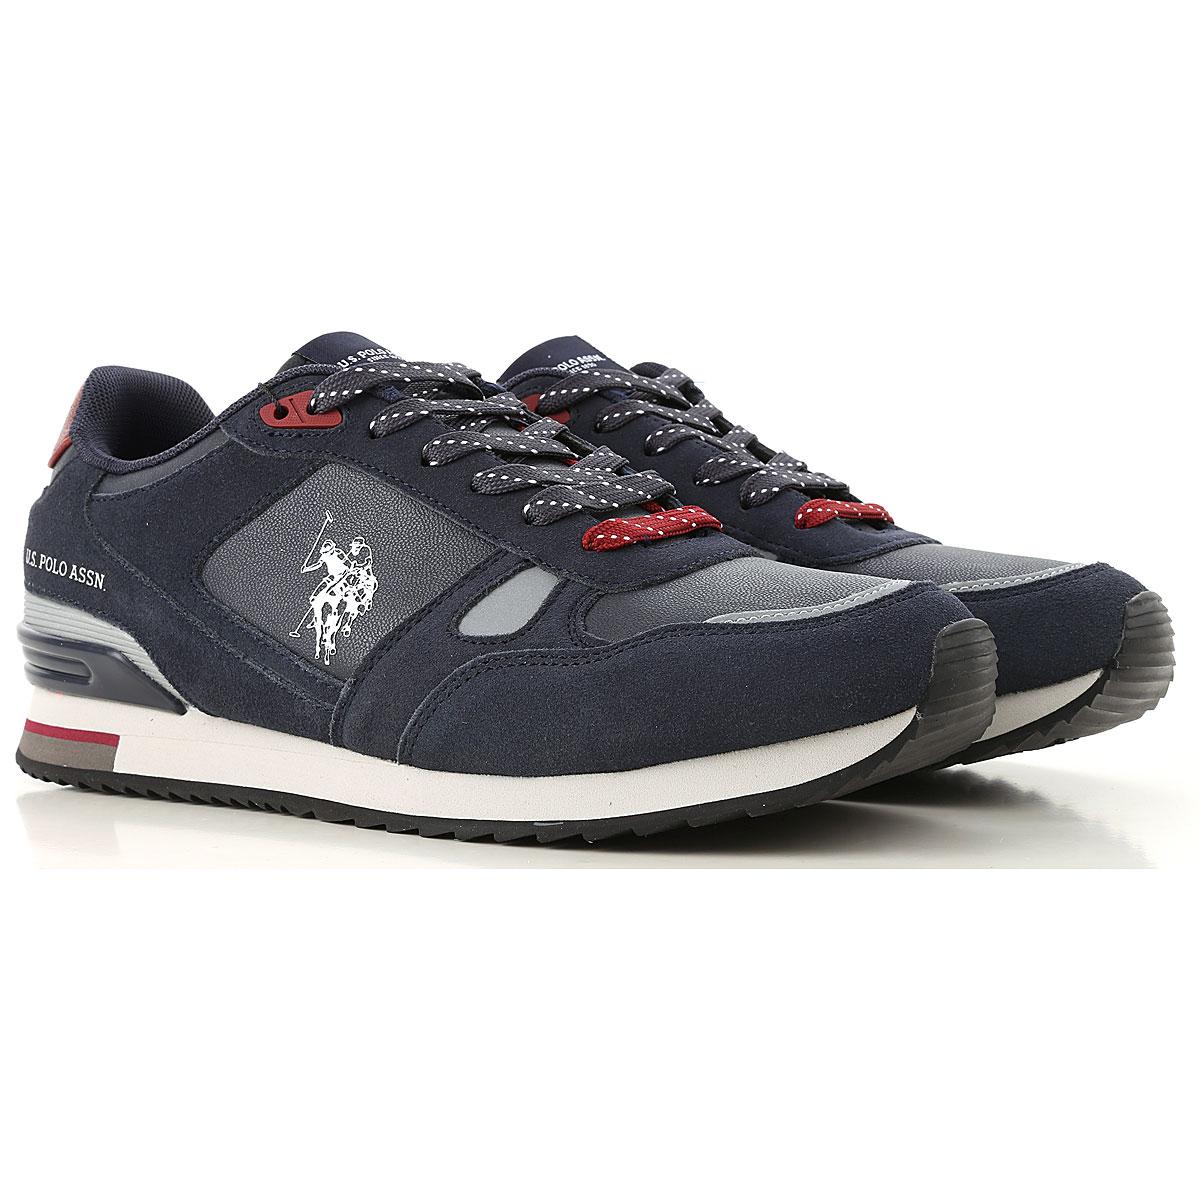 Image of U.S. Polo Sneakers for Men, Dark Blue, Leather, 2017, UK 6 - EUR 40 - US 7 UK 7 - EUR 41 - US 8 UK 8 - EUR 42 - US 9 UK 9 - EUR 43 - US 10 UK 10 - EUR 44 - US 11